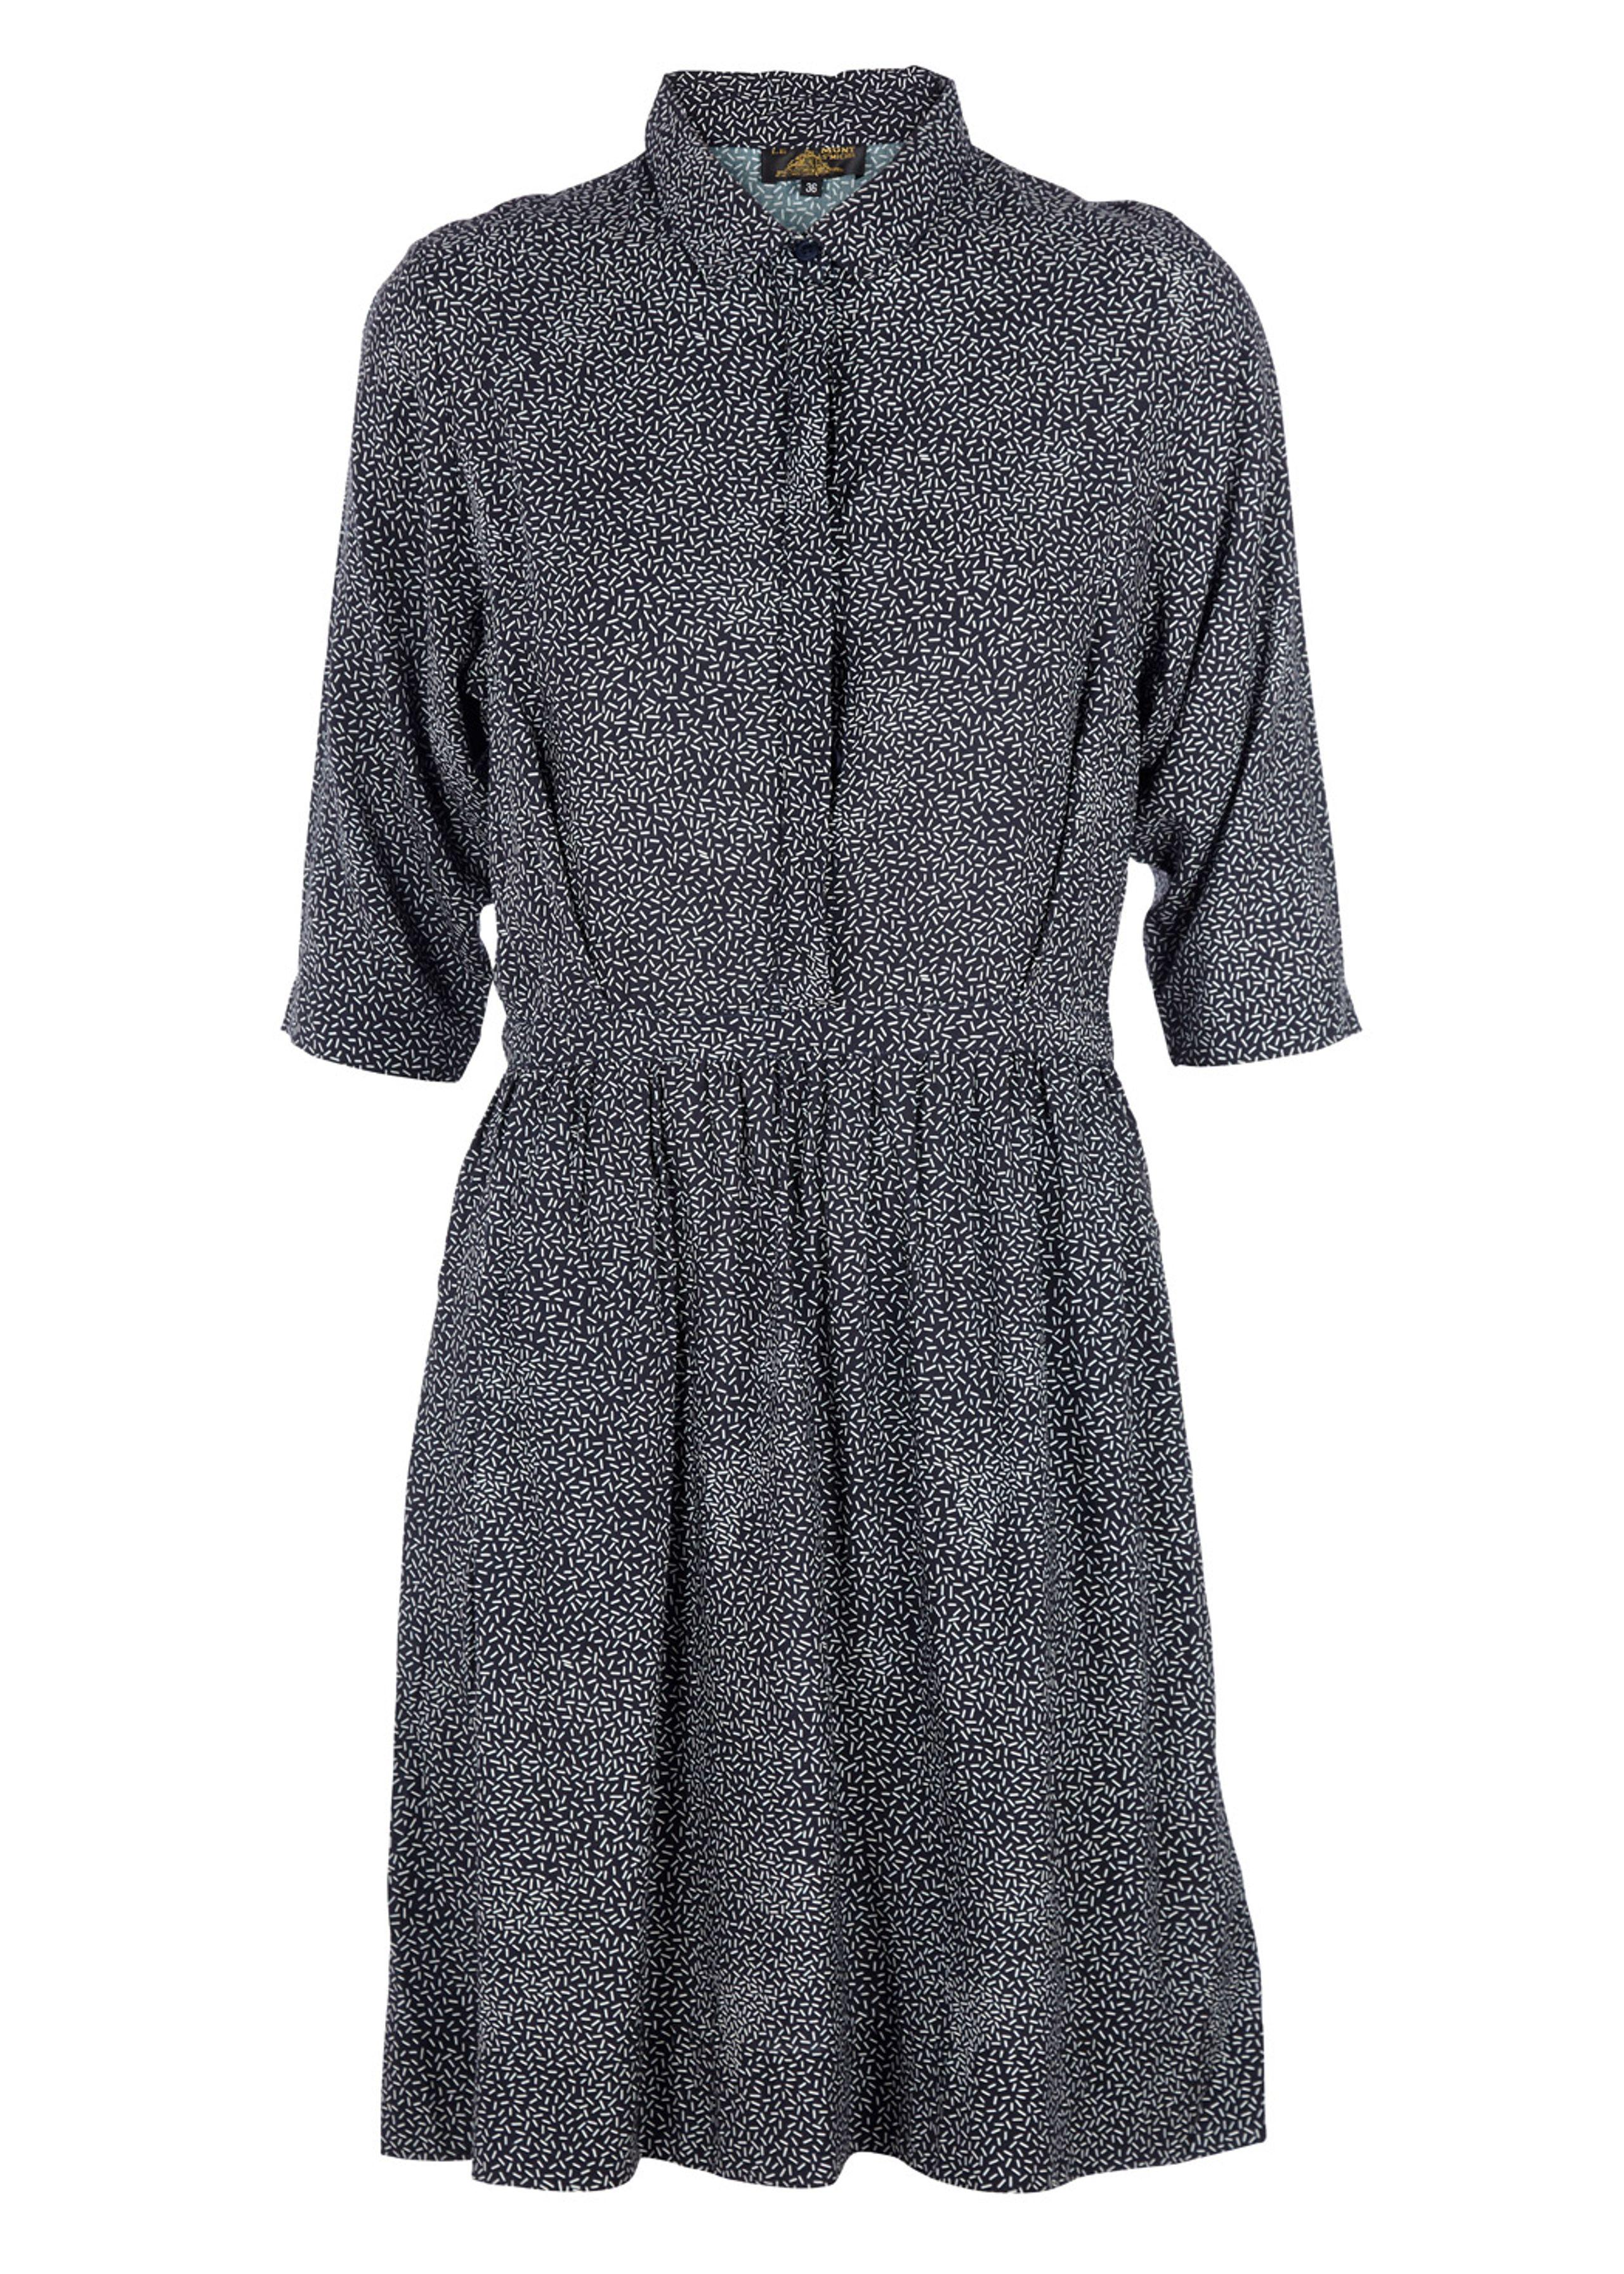 Stick print dress